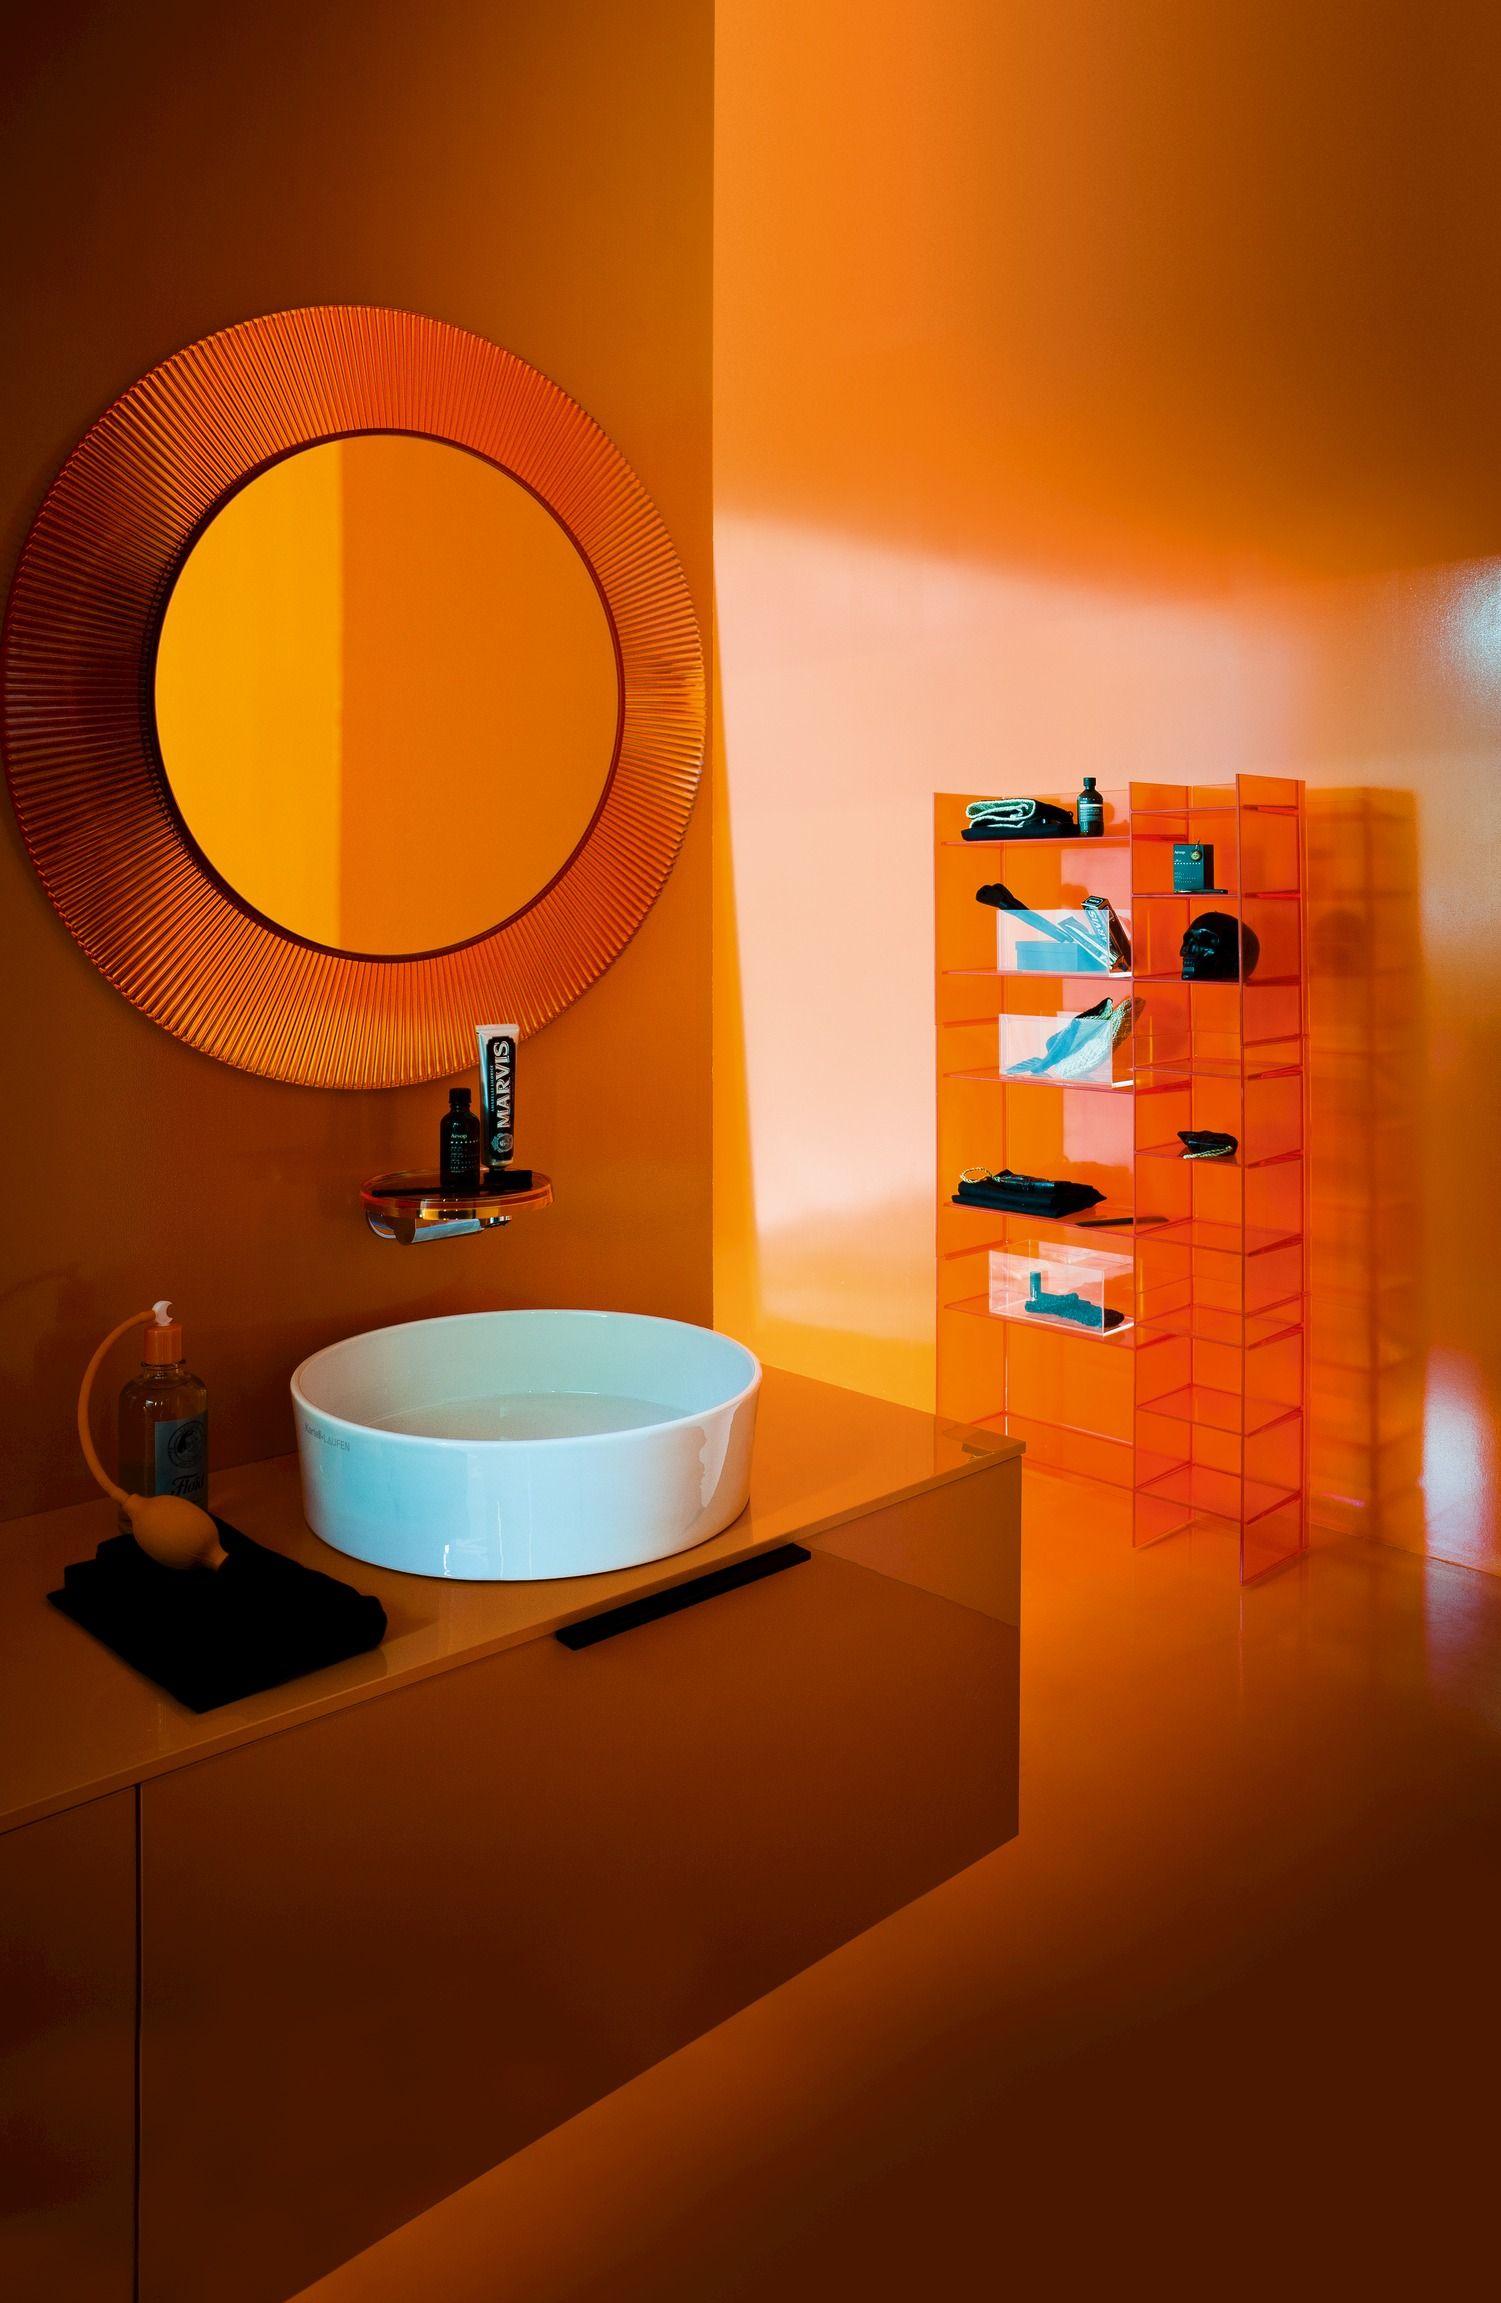 Kartellbylaufen Laufen Kartell Salledebain Meuble Orange Miroir Mural Decoration Murale Miroir Miroir Mural Rond